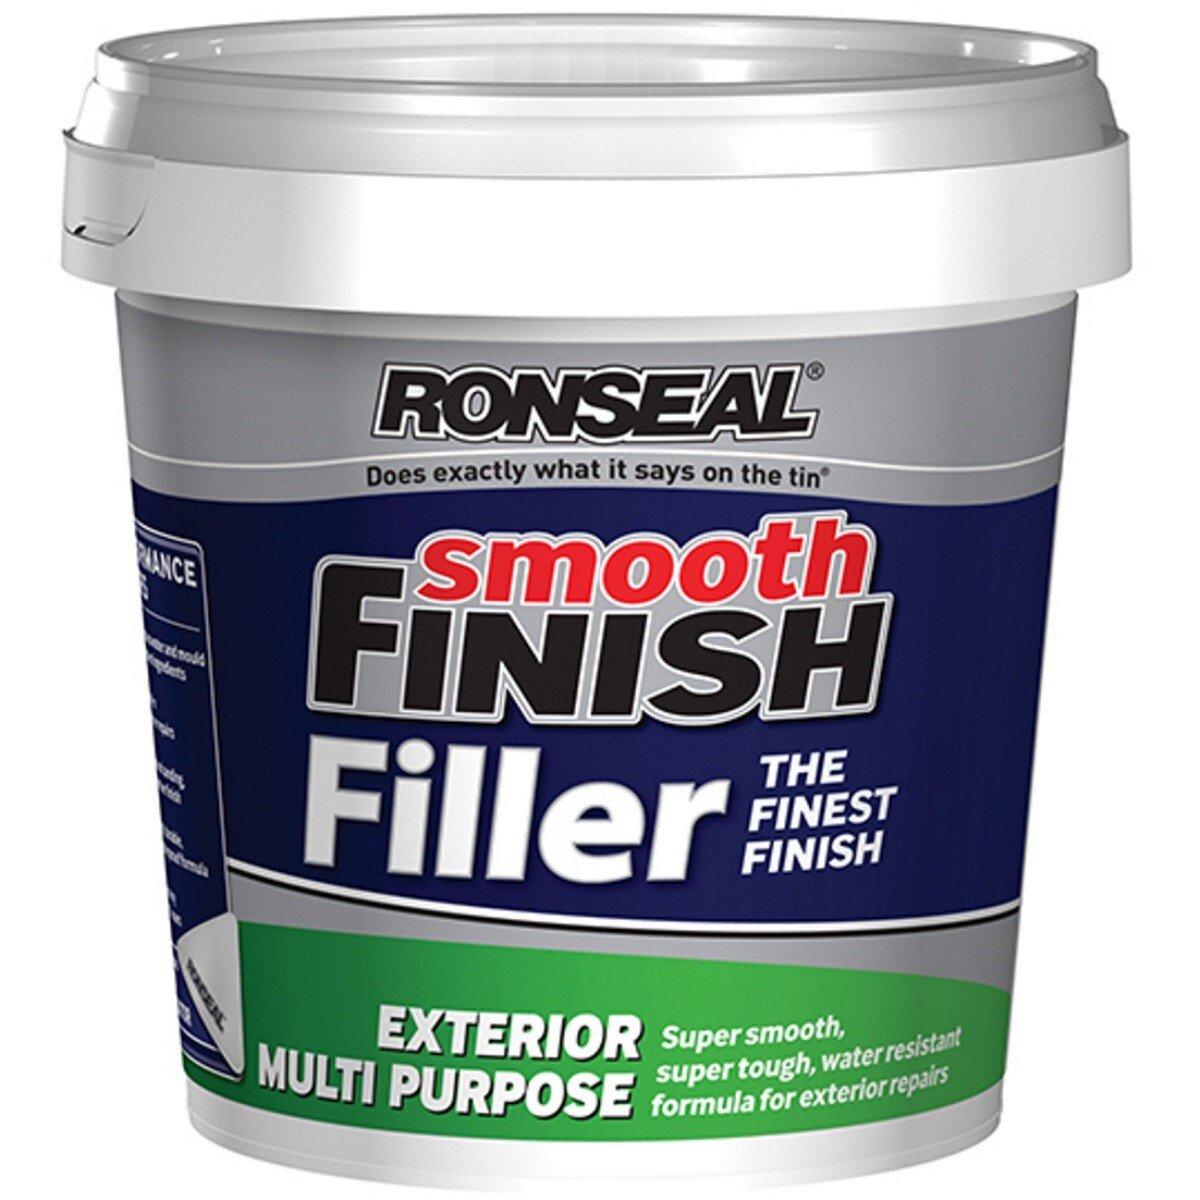 Ronseal 36562 Smooth Finish Exterior Multi Purpose Ready Mix Filler Tub 1.2kg RSLERMF12KG